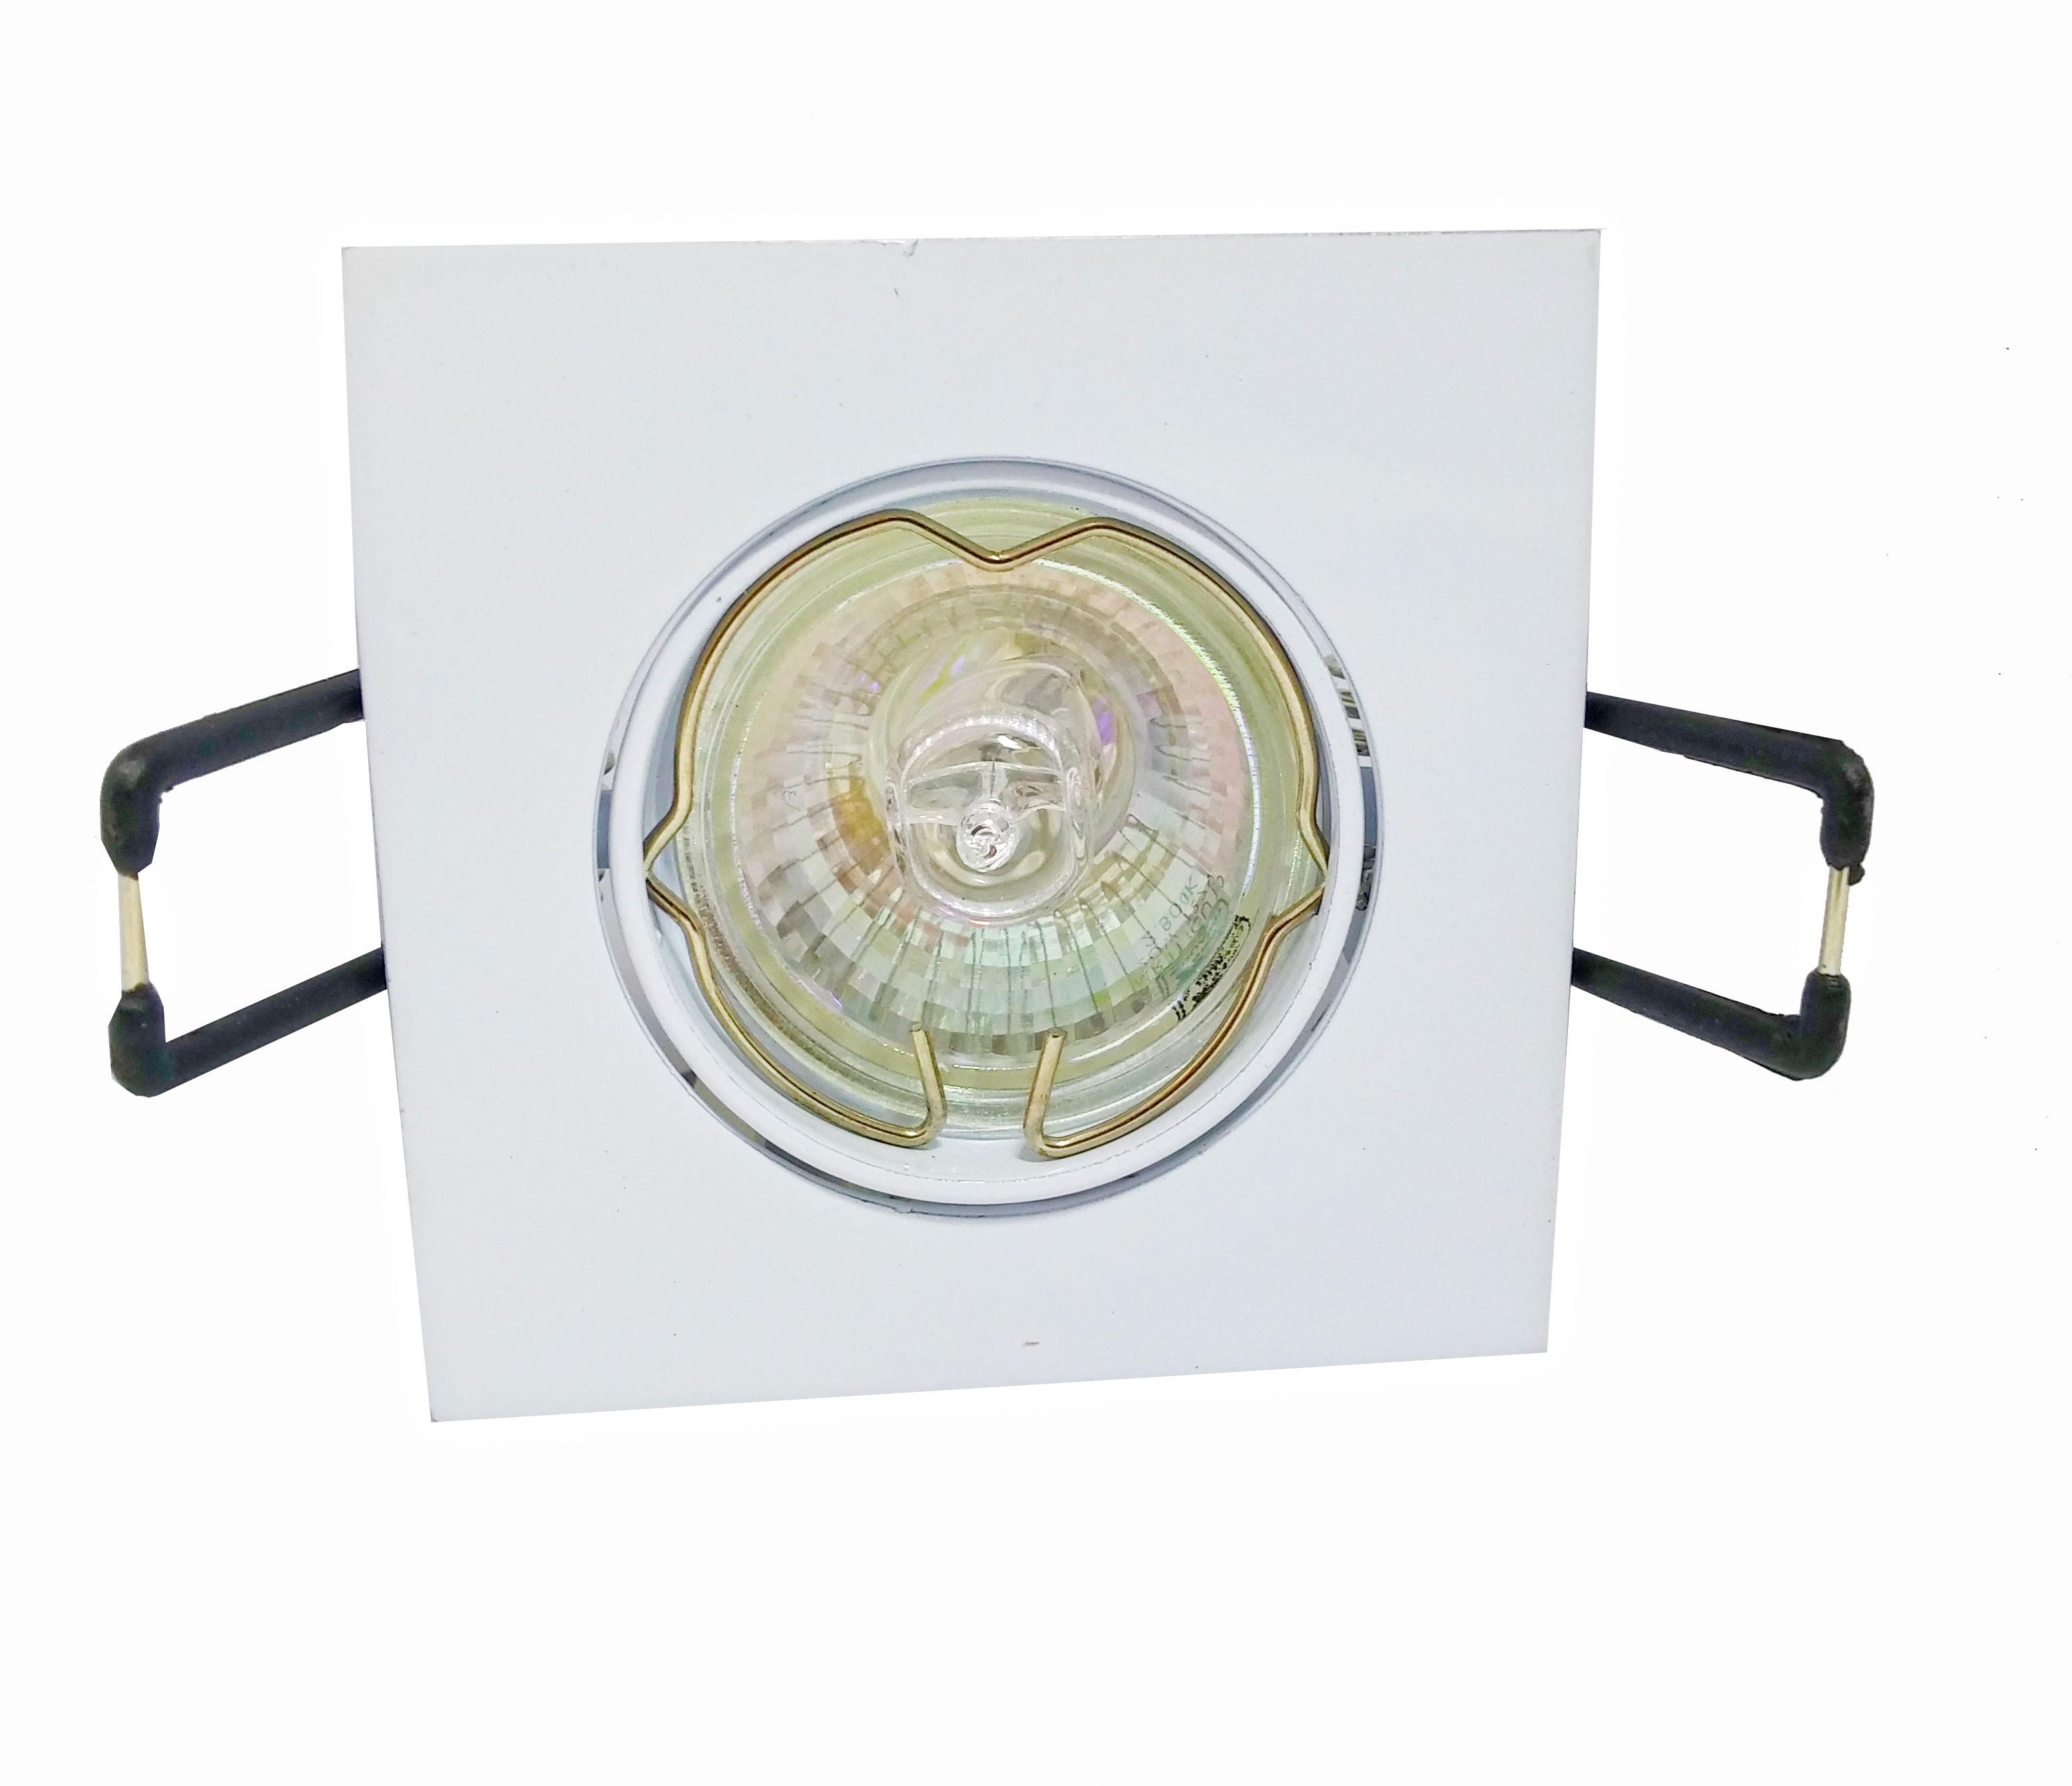 CONJUNTO -Lâmpada Mini Dicróica Halógena (Sem reator) GU10+Spot Basculante Alumínio Zamac Mini Quadrado